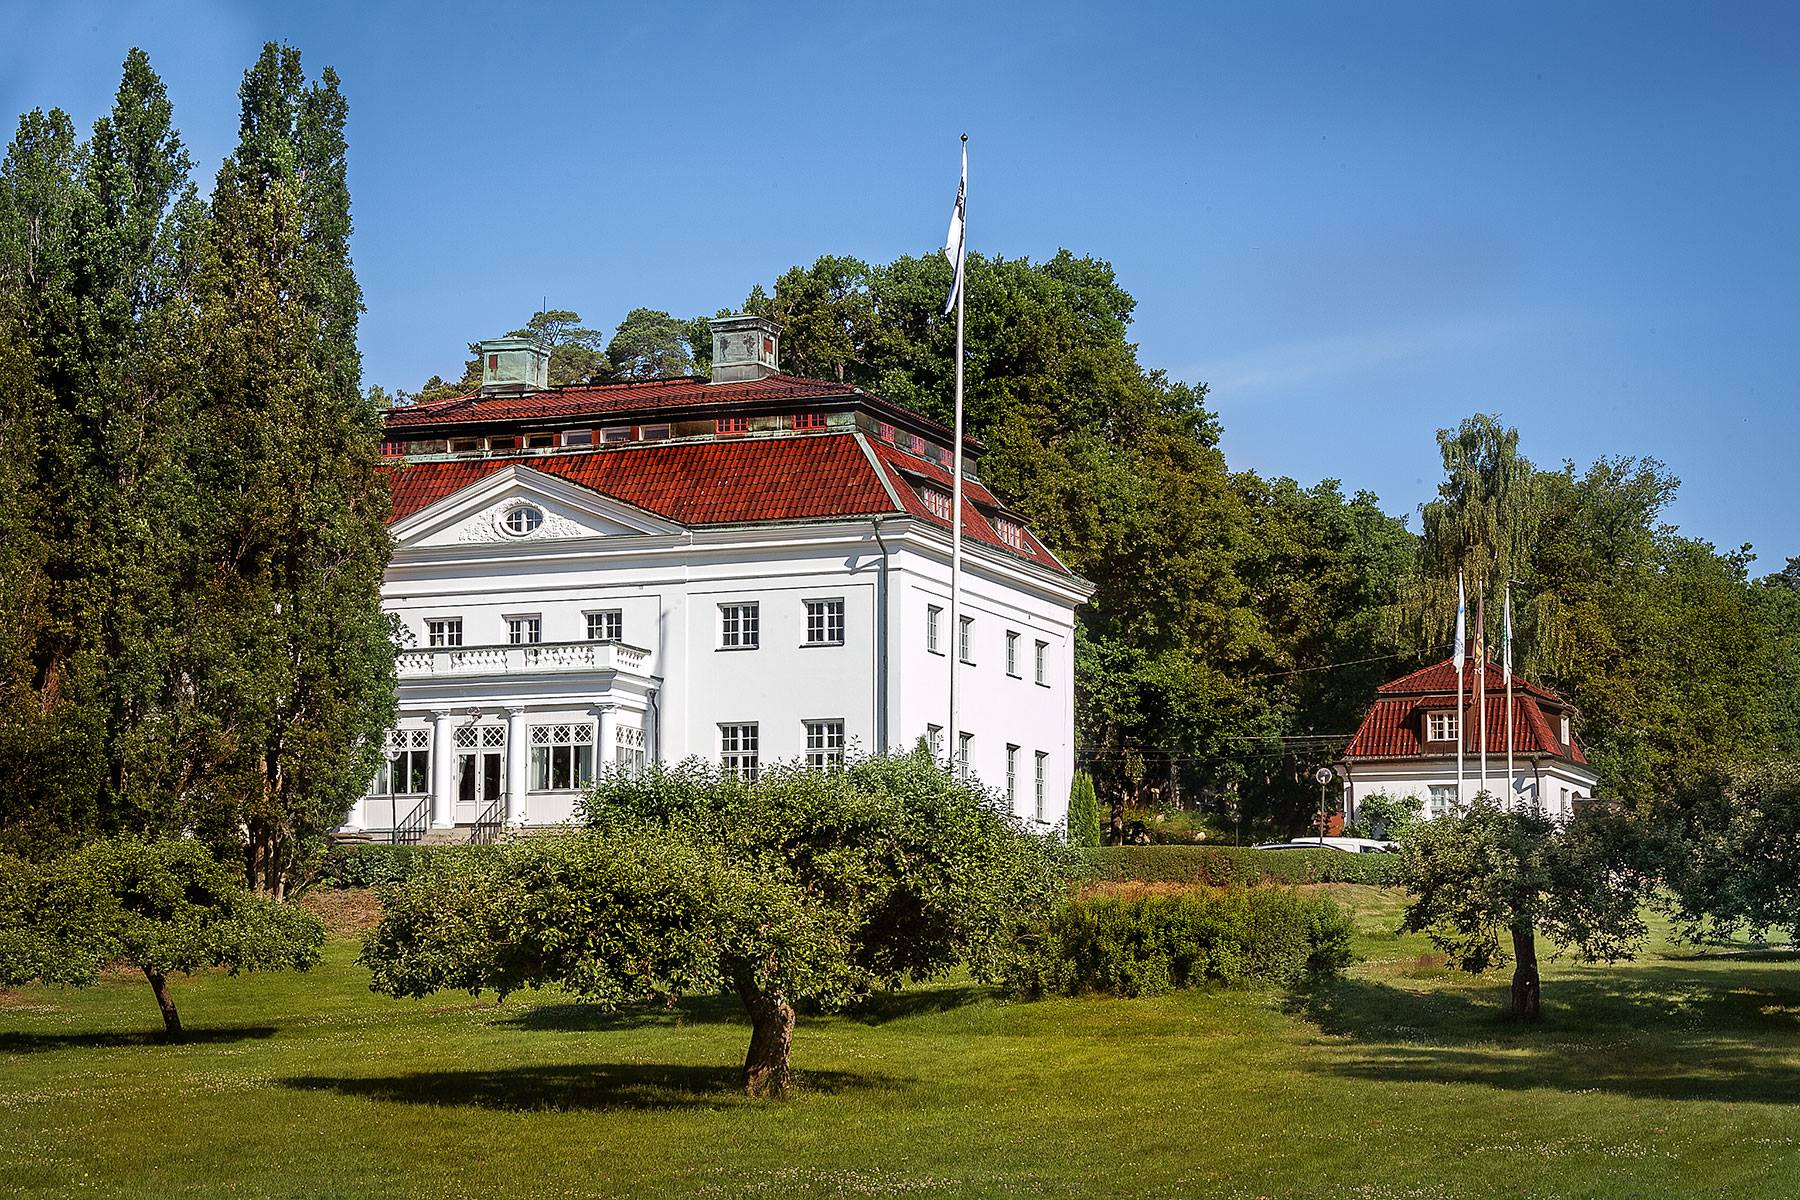 Bergendal Herrgården